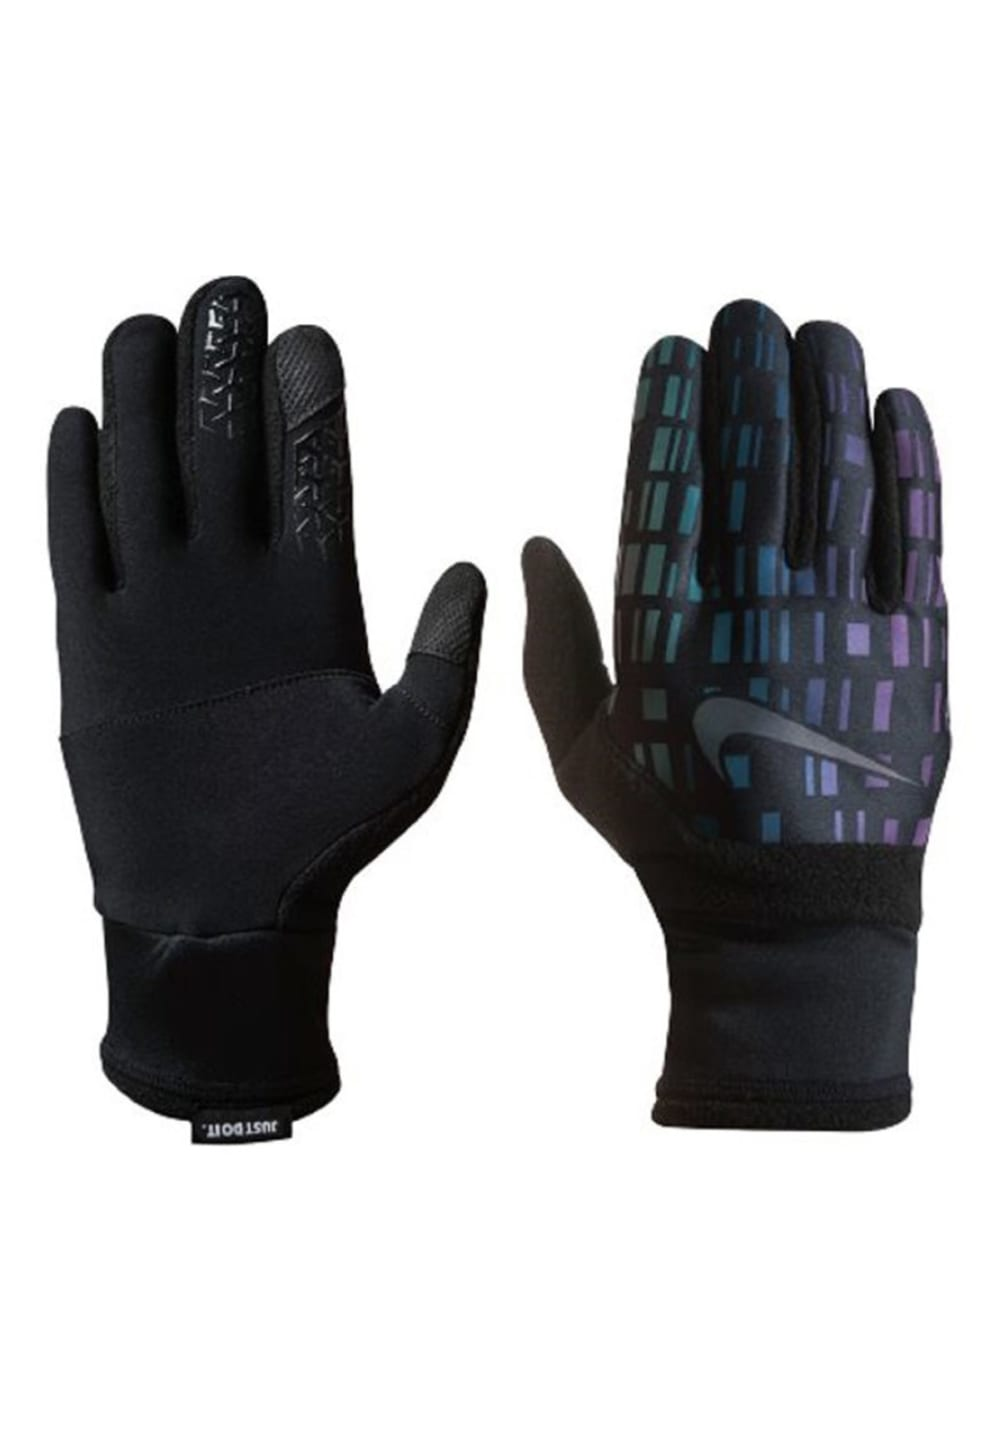 Nike Vapor Flash Run Gloves 3.0 - Running gloves for Women - Black ... 272a3762df